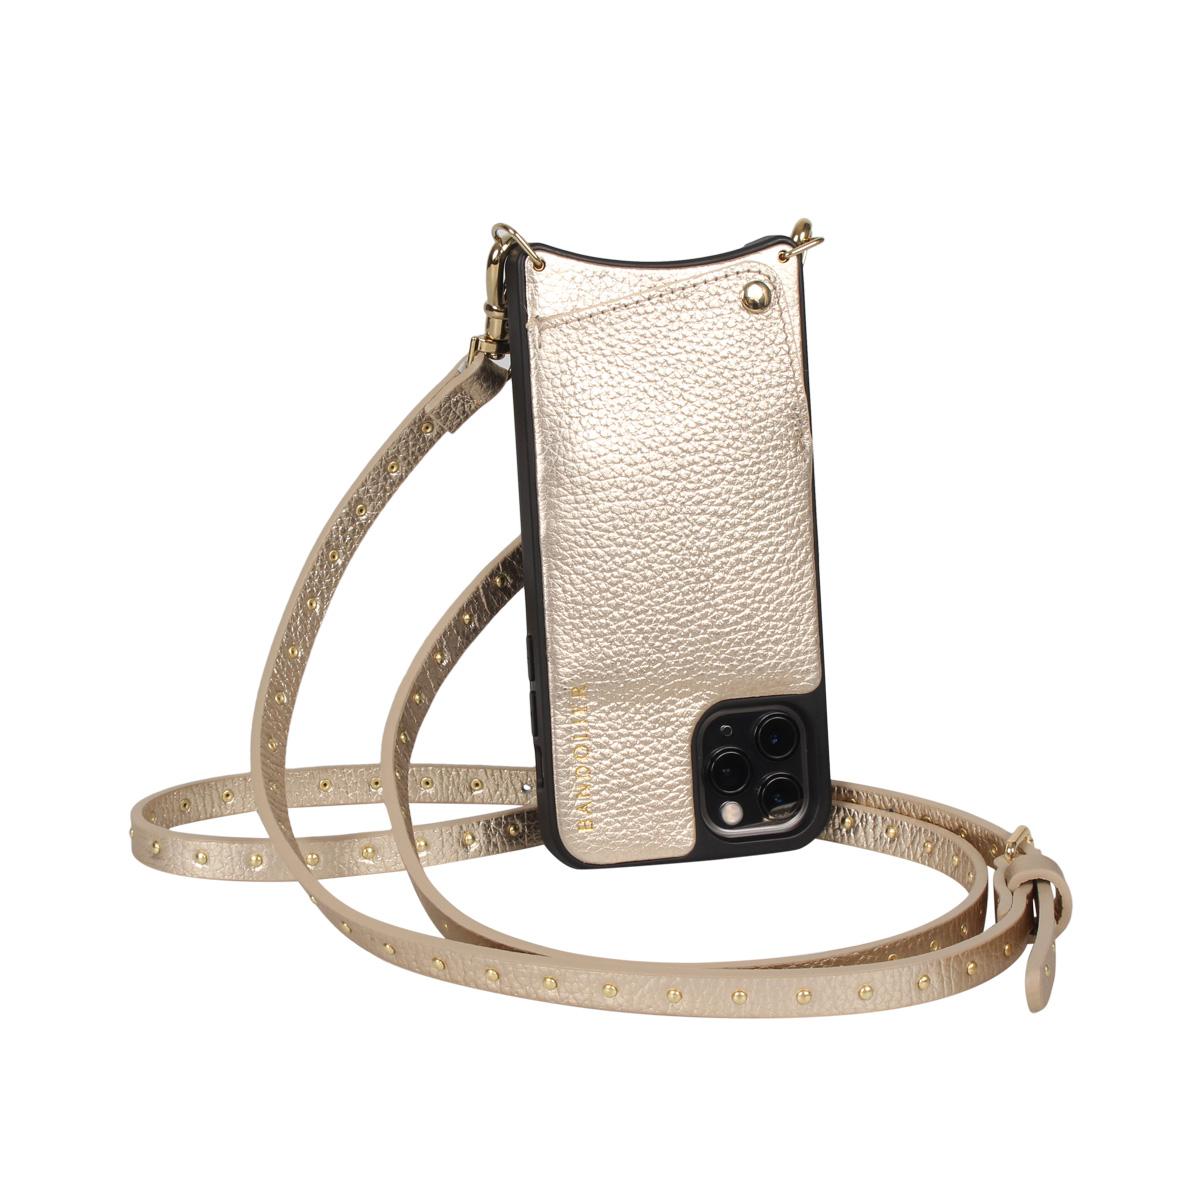 BANDOLIER NICOLE RICH GOLD バンドリヤー iPhone XR ケース スマホ 携帯 ショルダー アイフォン メンズ レディース レザー ゴールド 10NIC